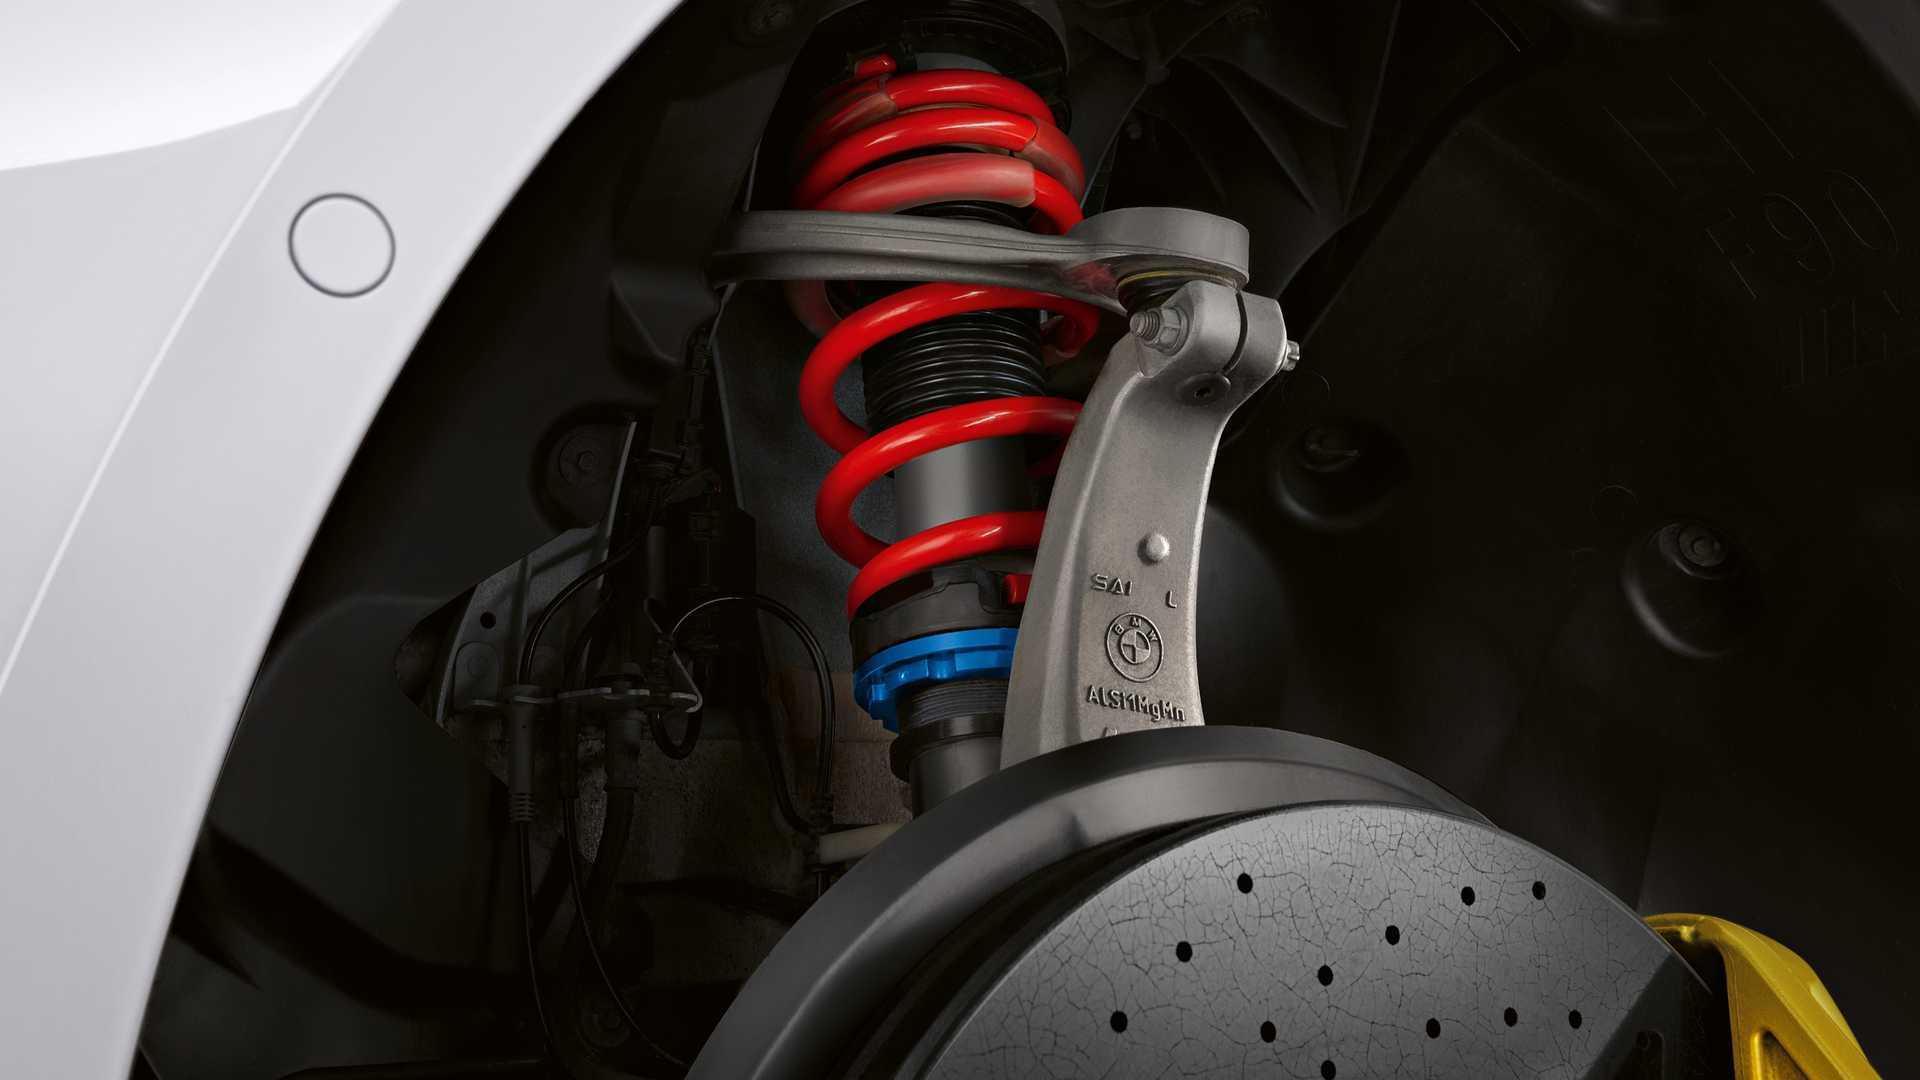 https://cdn.motor1.com/images/mgl/2XkLk/s1/m-performance-parts-fur-m5-competition-2020.jpg